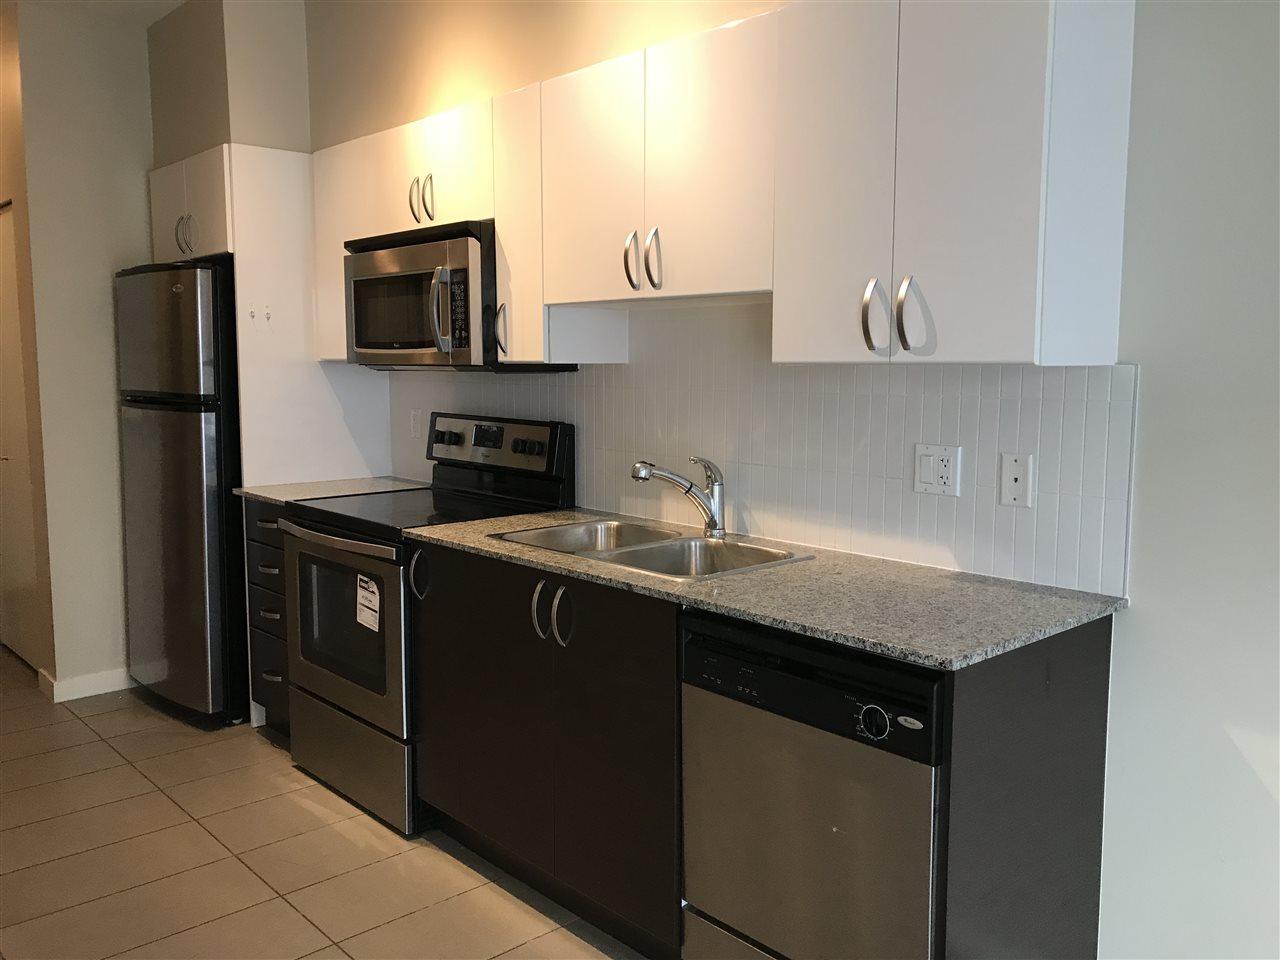 For Sale: 206 - 13728 108 Avenue, Surrey, BC   1 Bed, 1 Bath Condo for $365,000. See 17 photos!